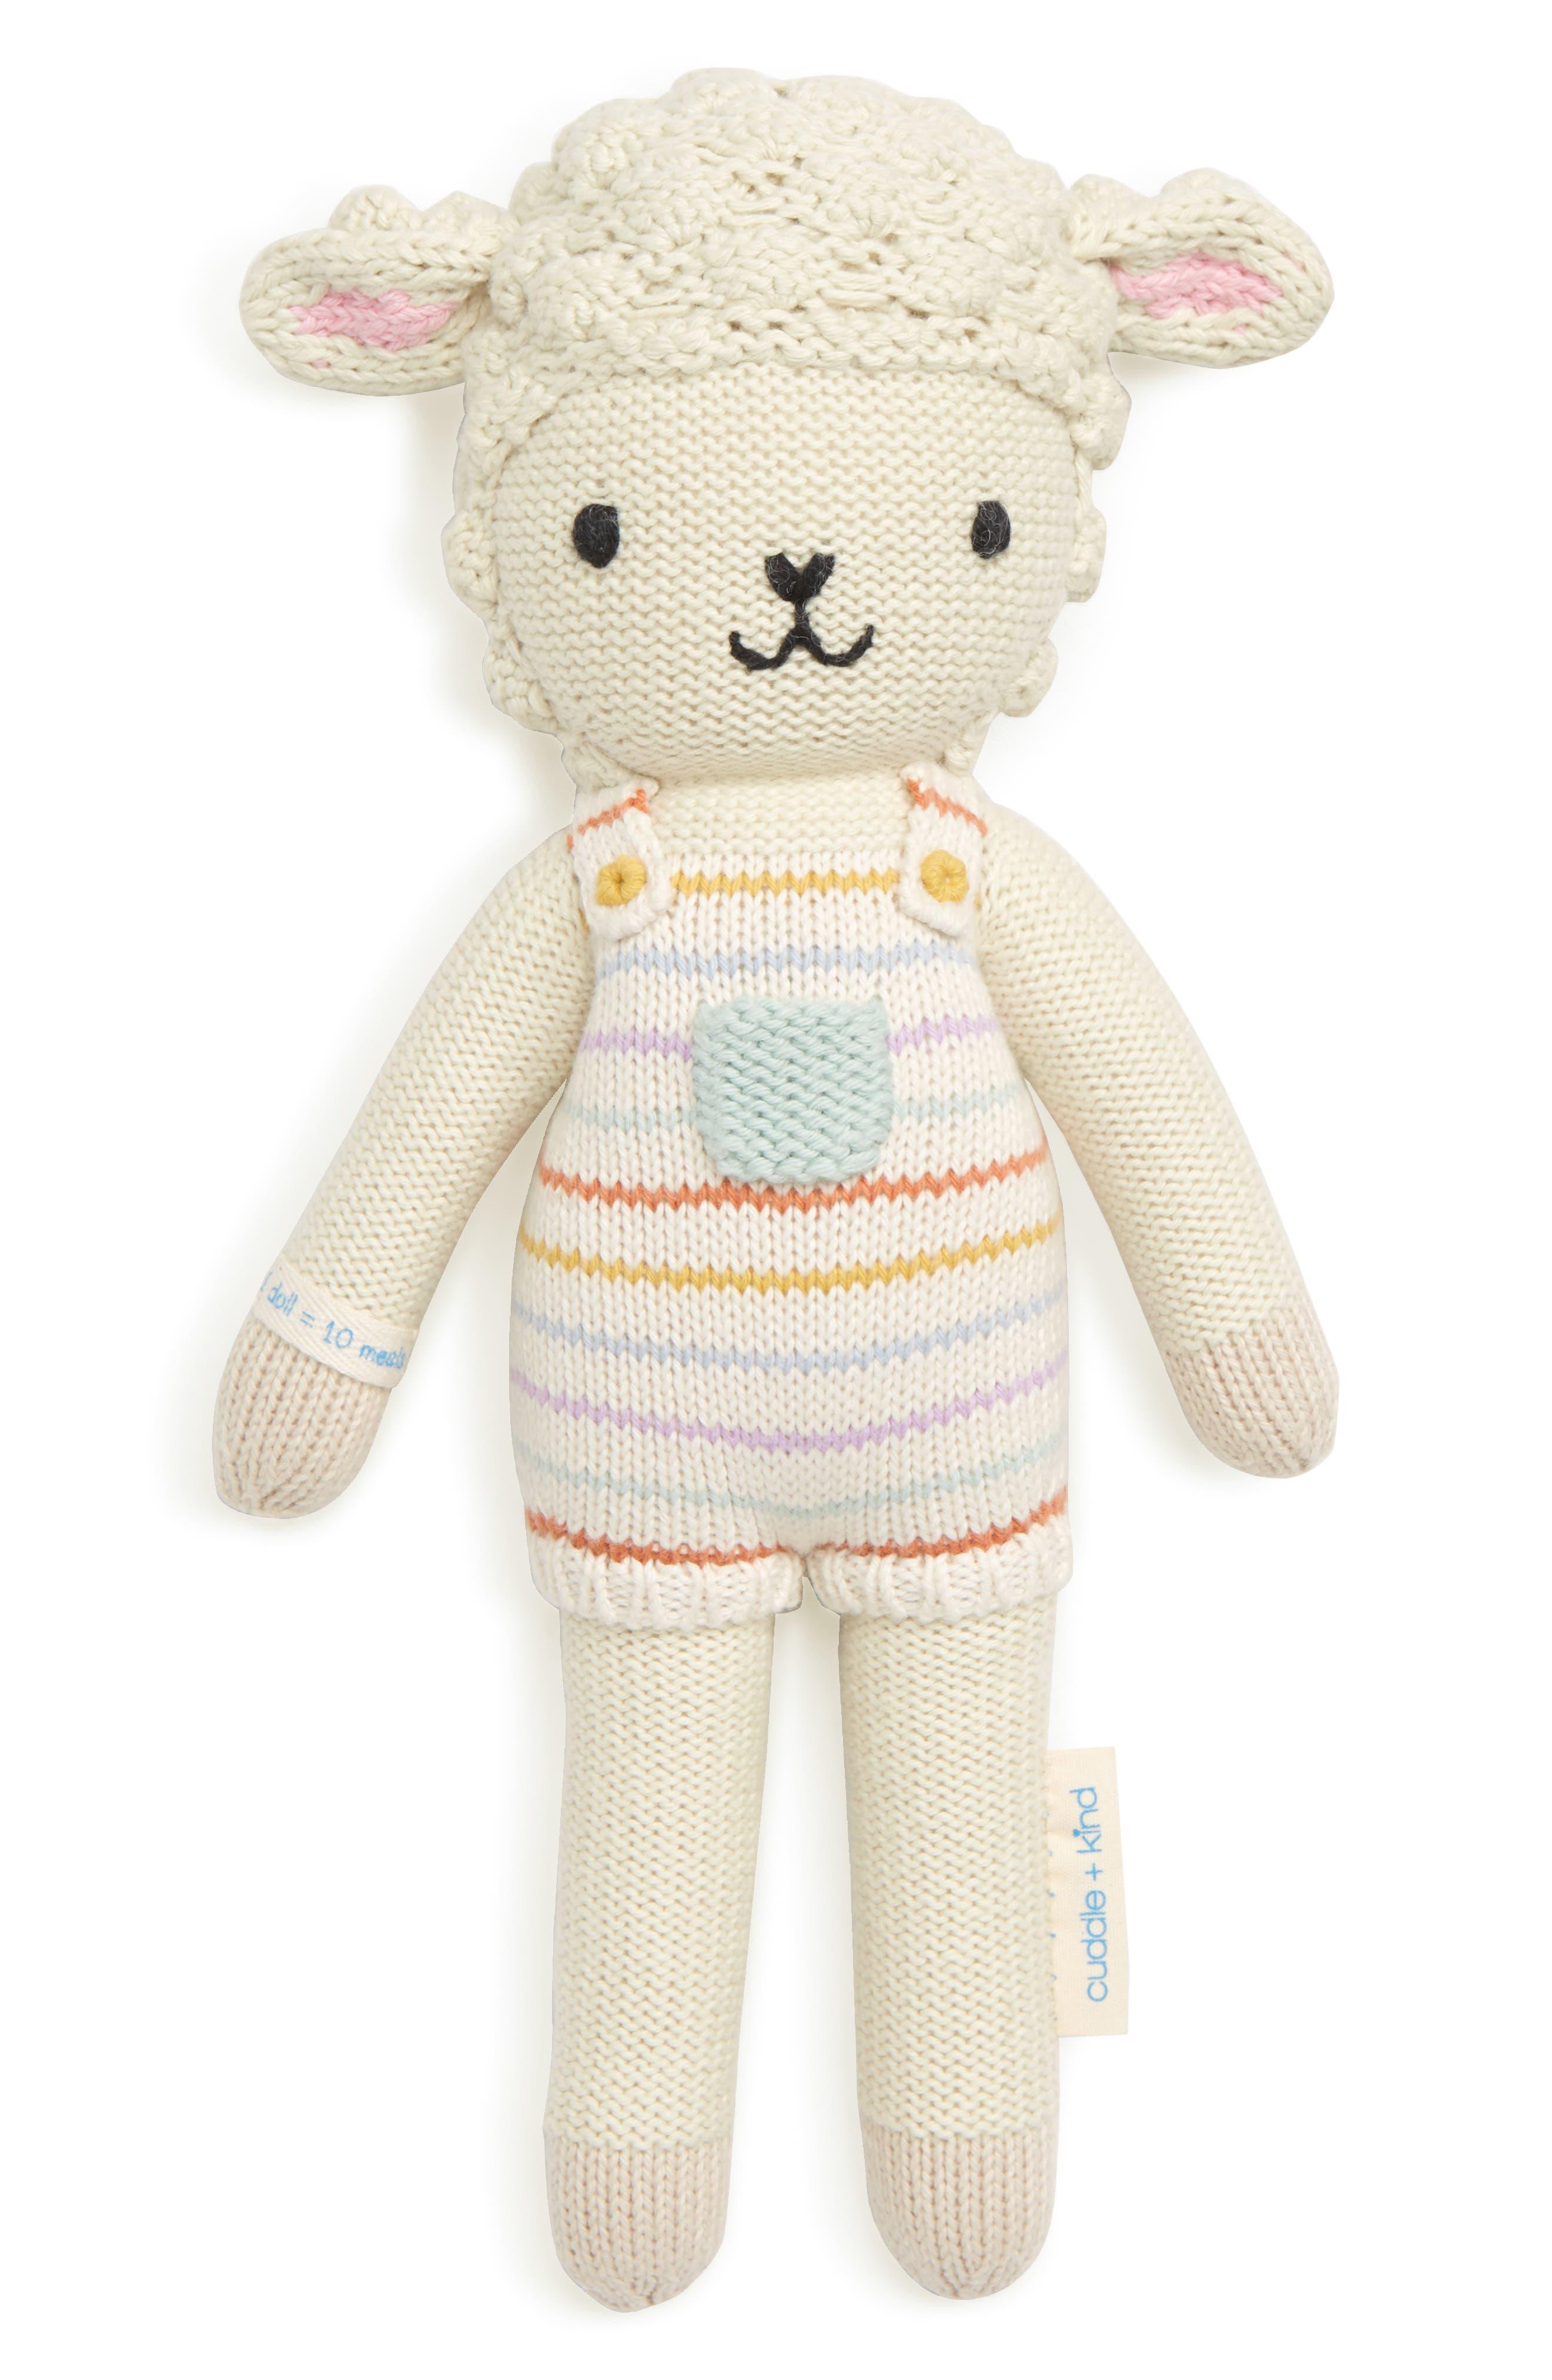 cuddle + kind Avery the Lamb Stuffed Animal,                         Main,                         color, 100